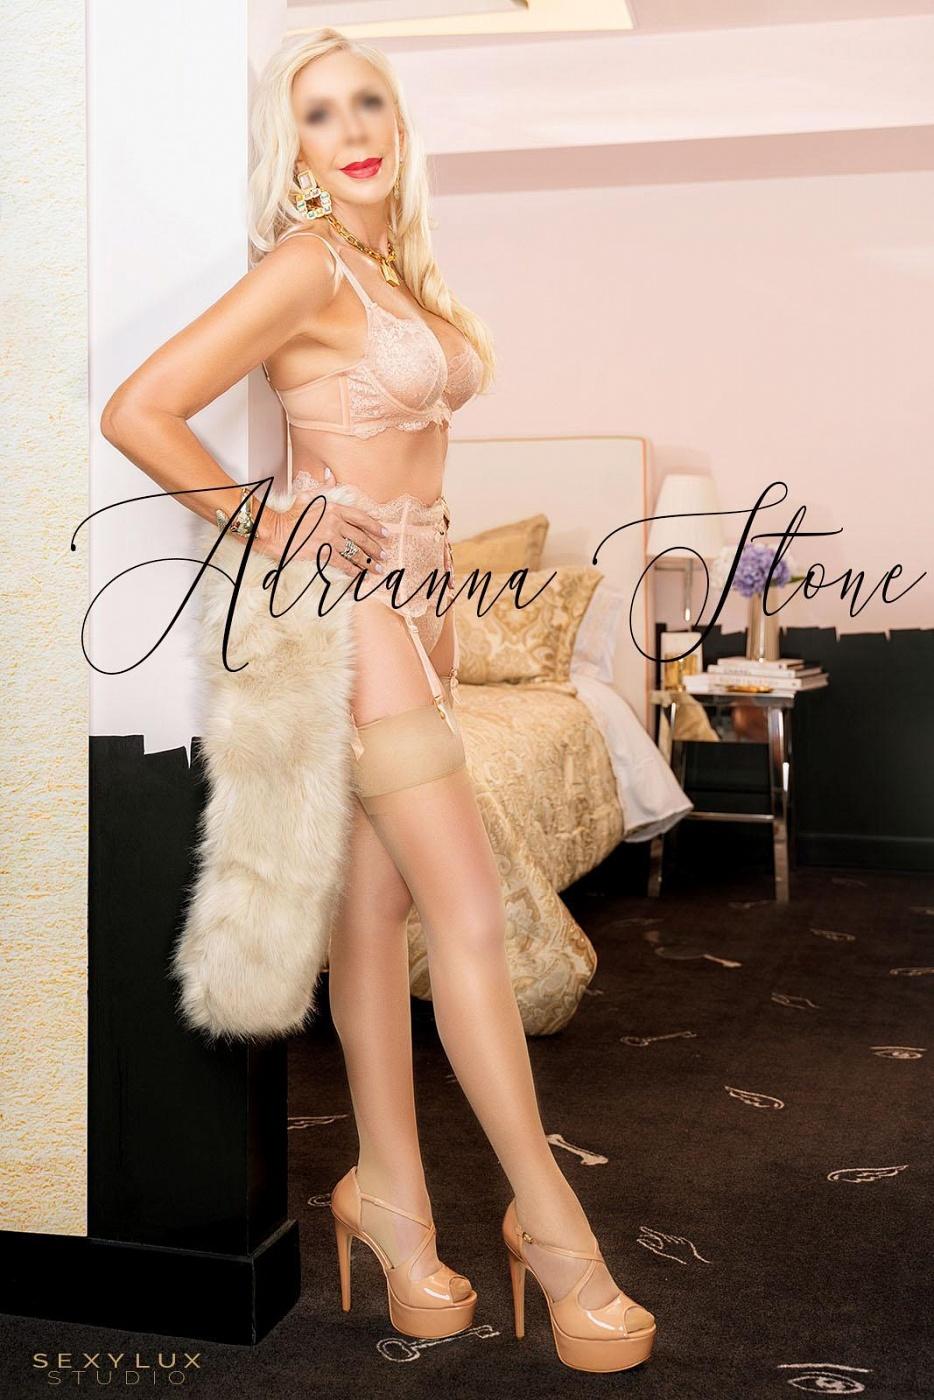 Adrianna Stone